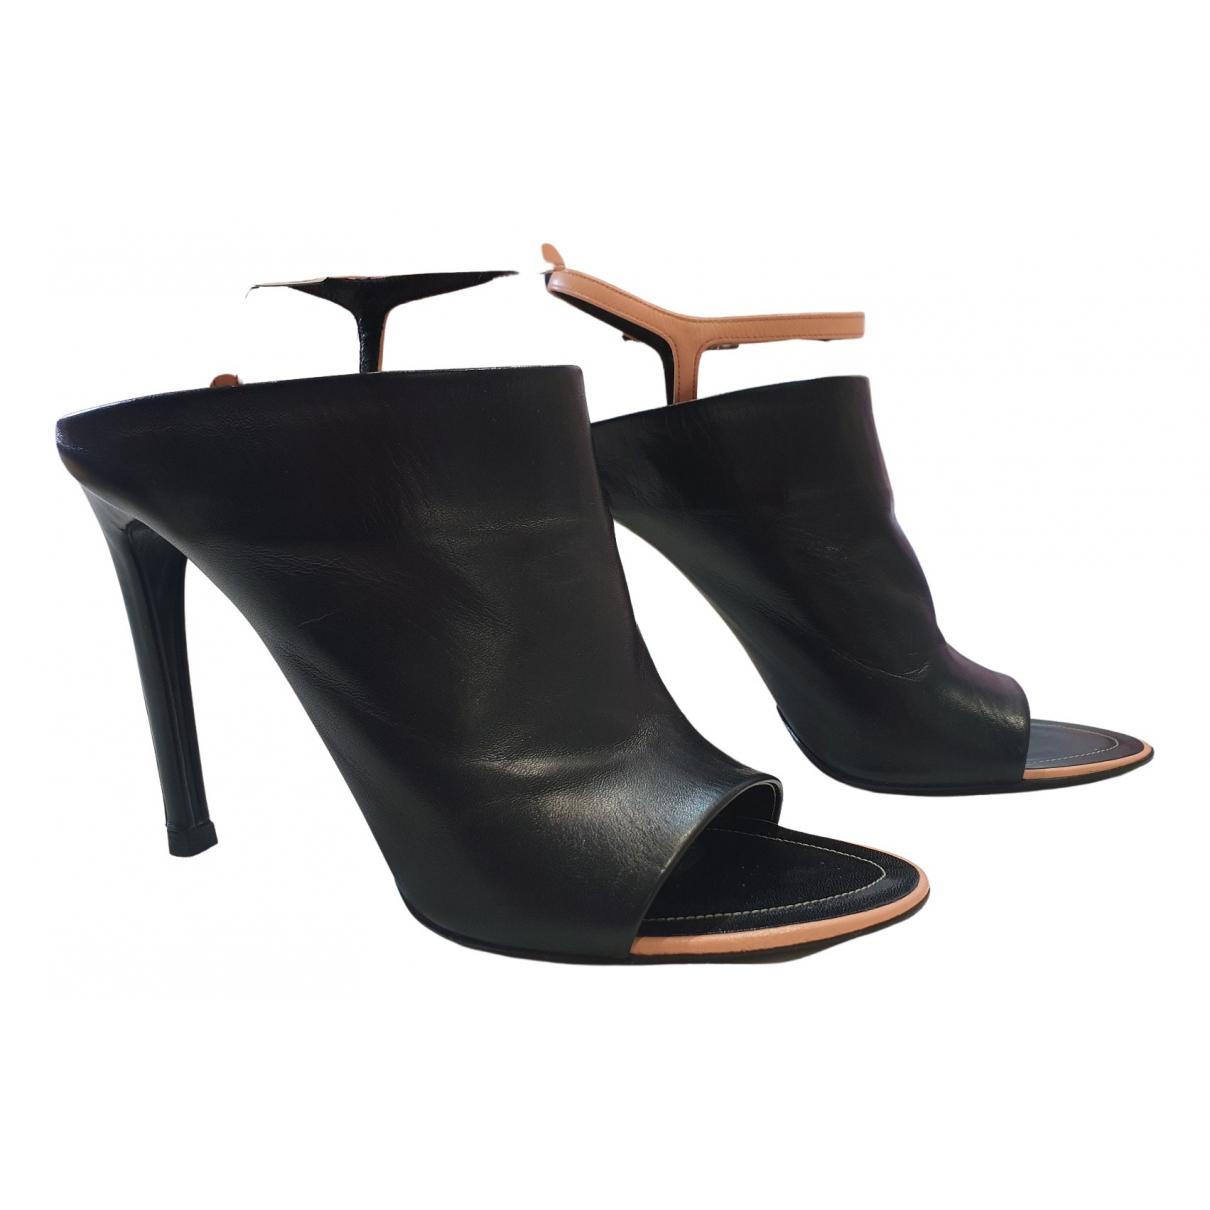 Balenciaga \N Black Leather Sandals for Women 40.5 EU